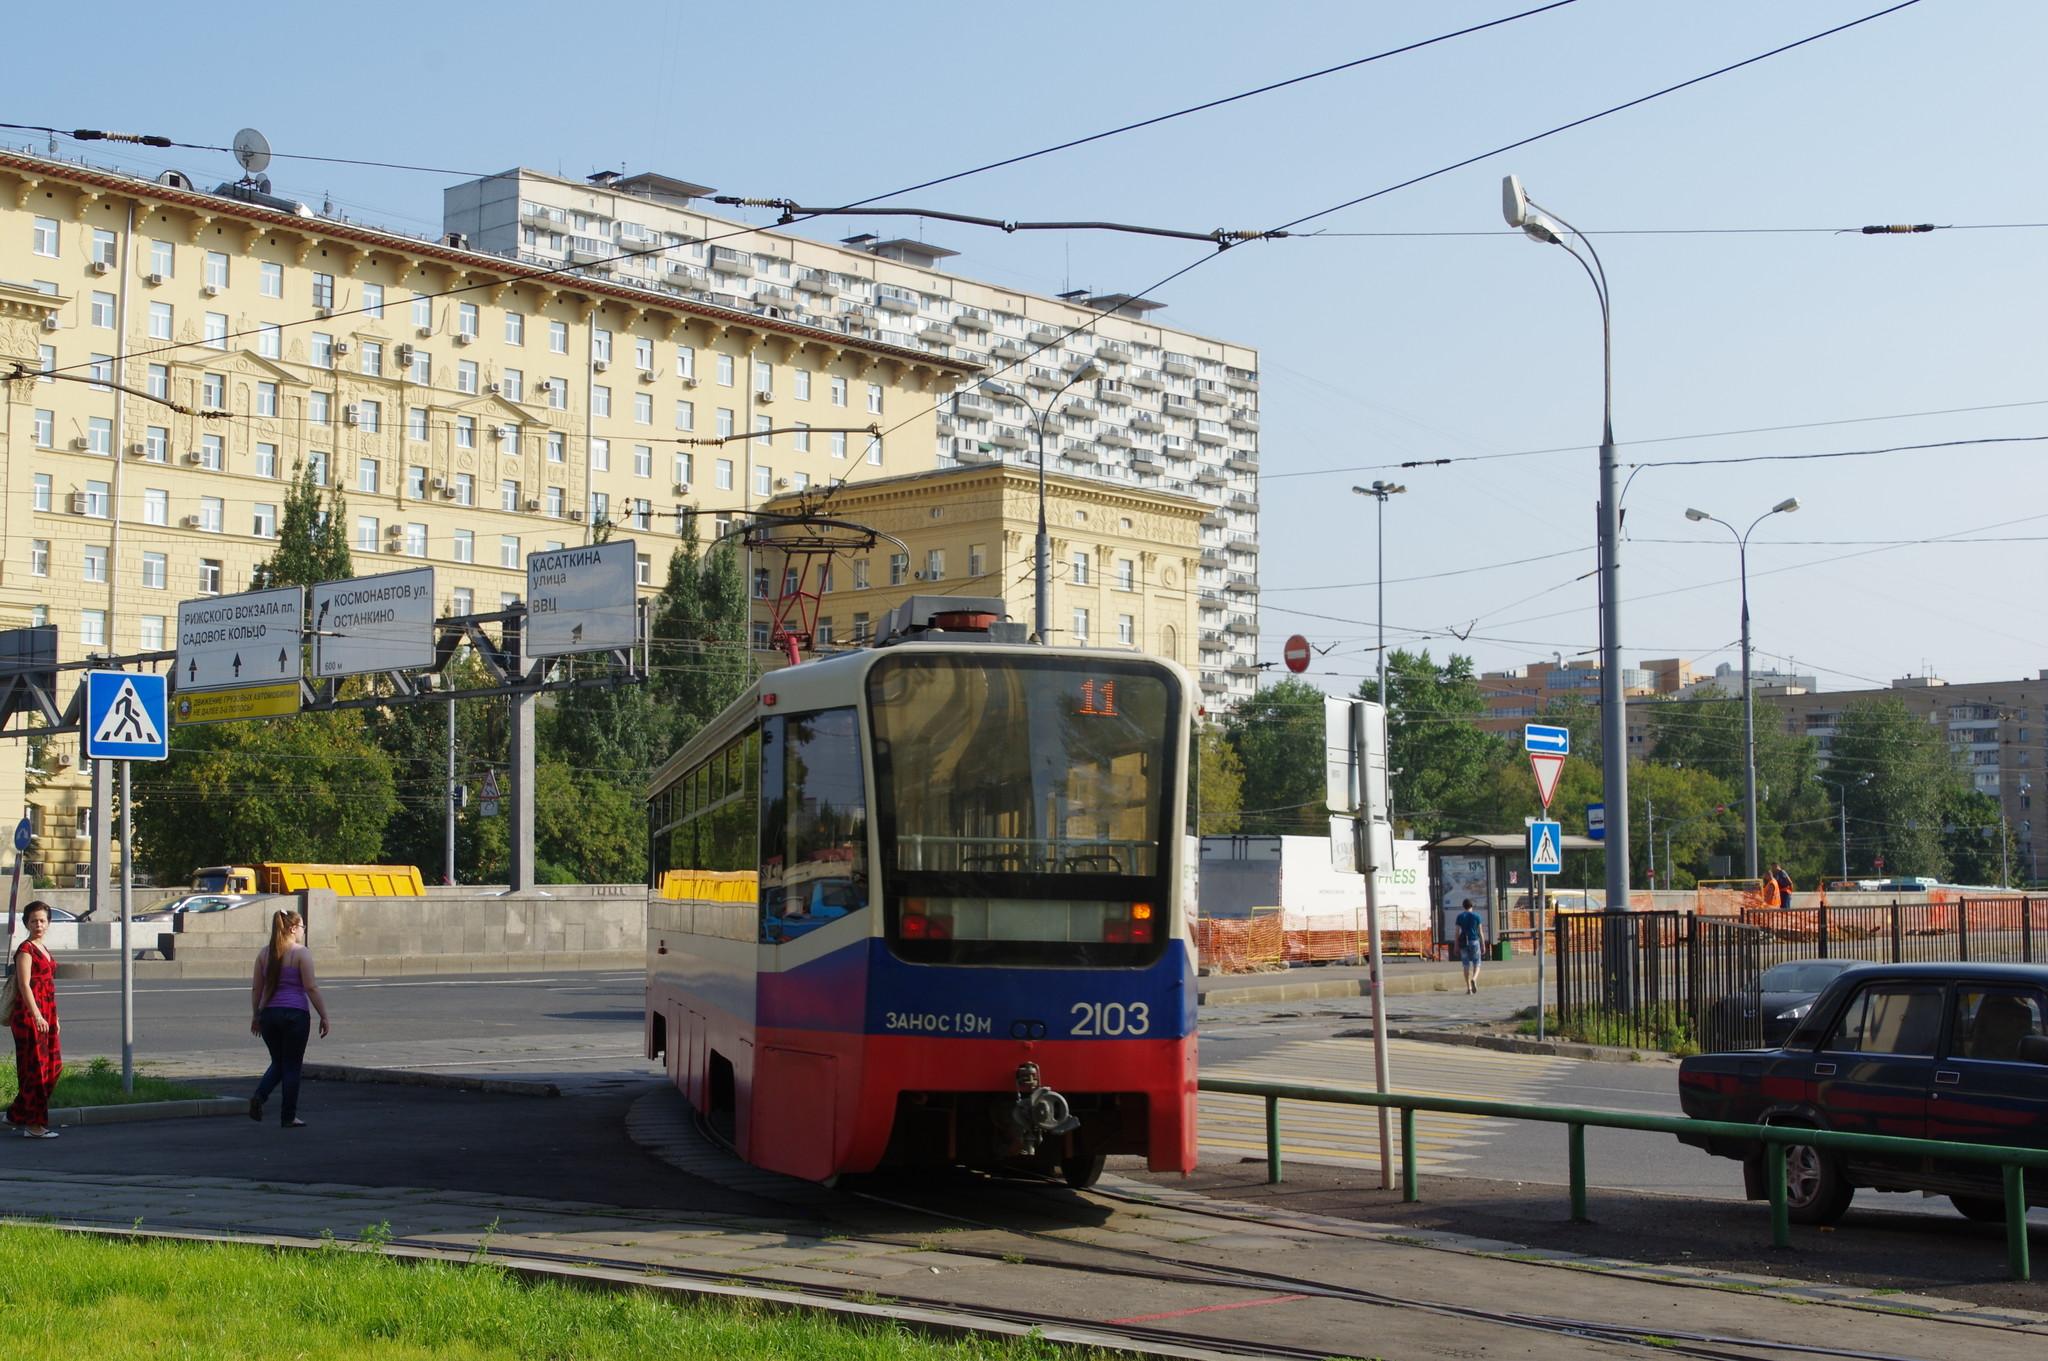 Трамвайный вагон № 2103 модель 71-619КТ (КТМ-19Т) на маршруте № 11. Улица Сергея Эйзенштейна